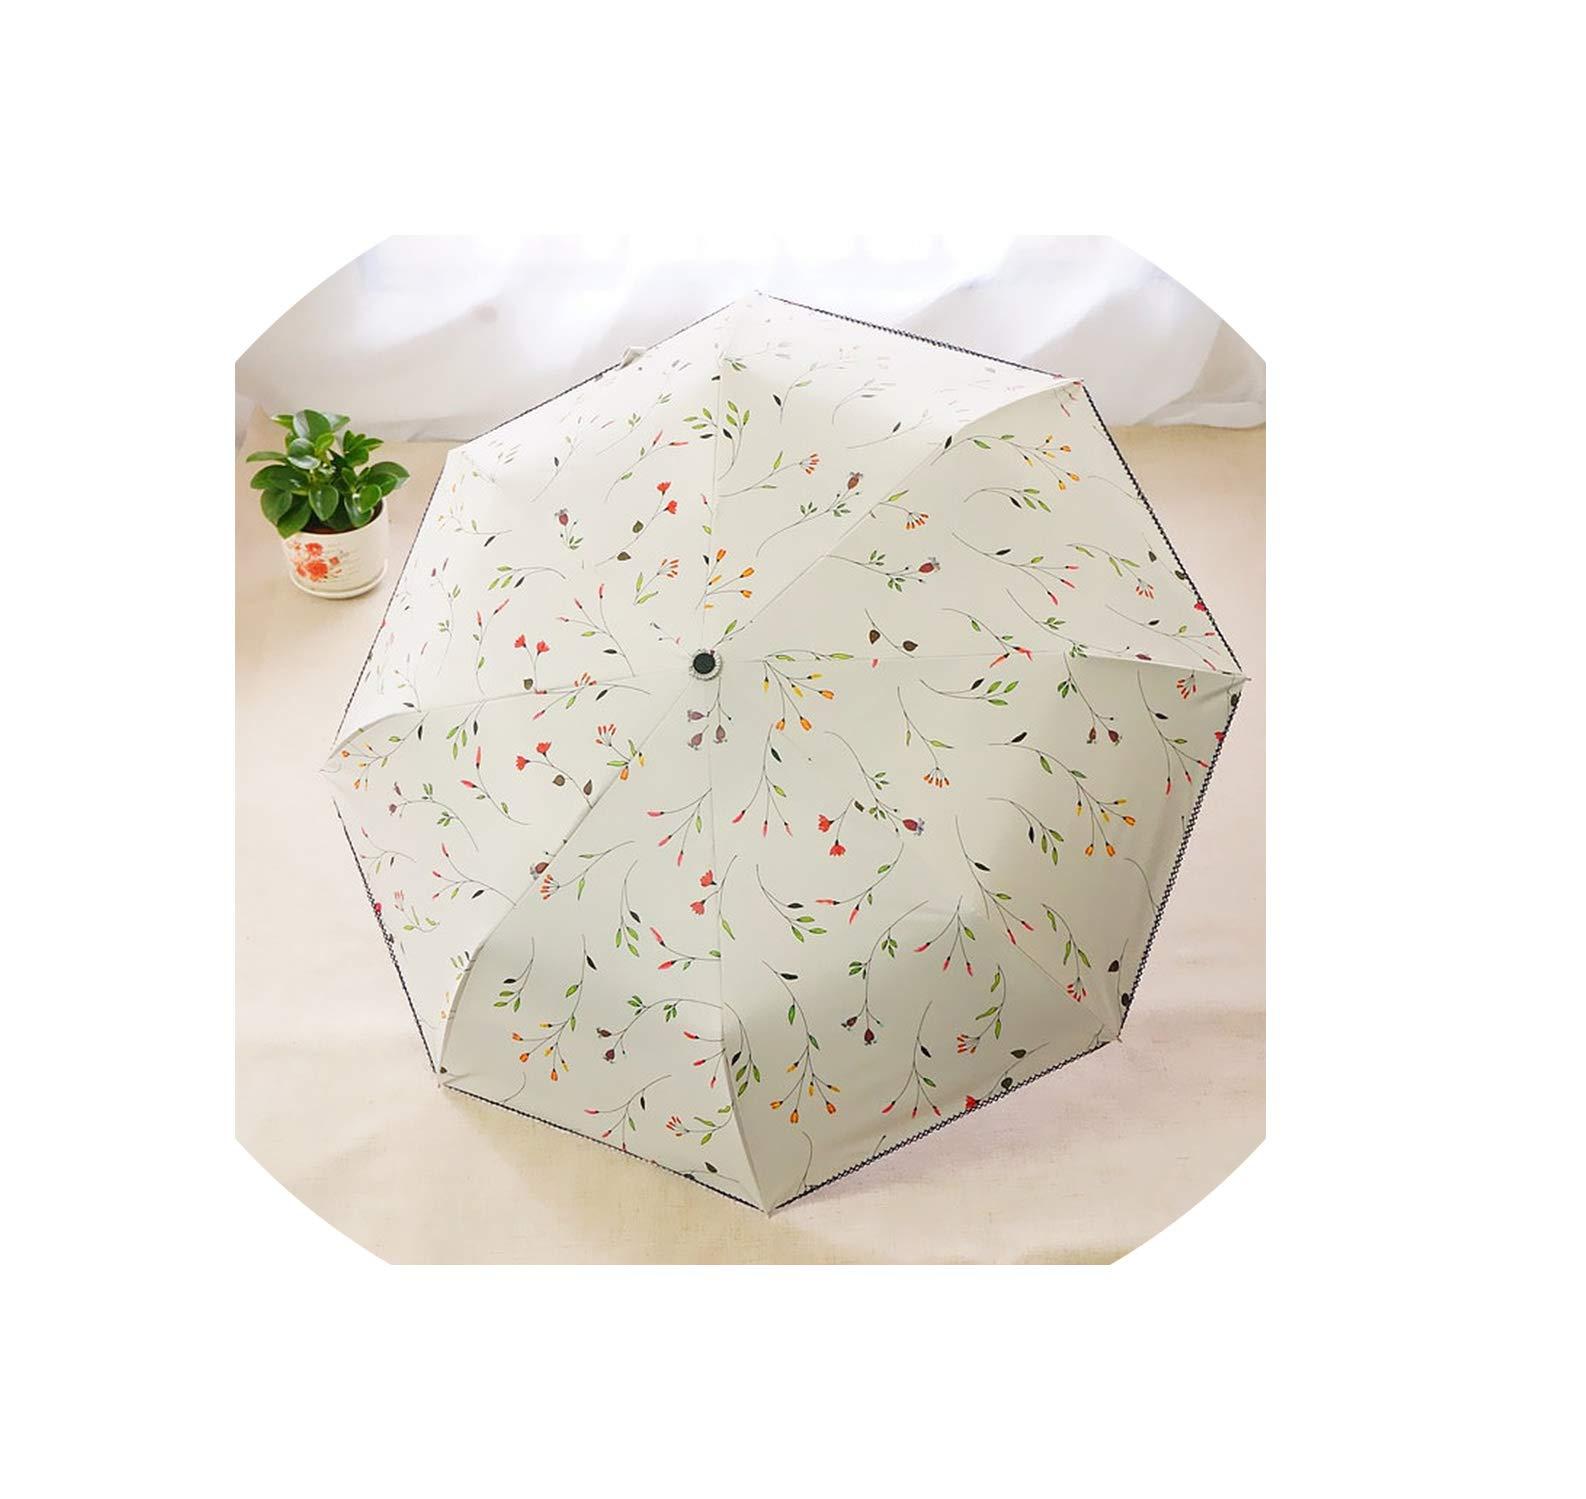 New Arrive Umbrella Anti Uv Upf55+ Strong Windproof Auto Open Auto Close No Rust Frame Rubber Handle Lace For Women,White